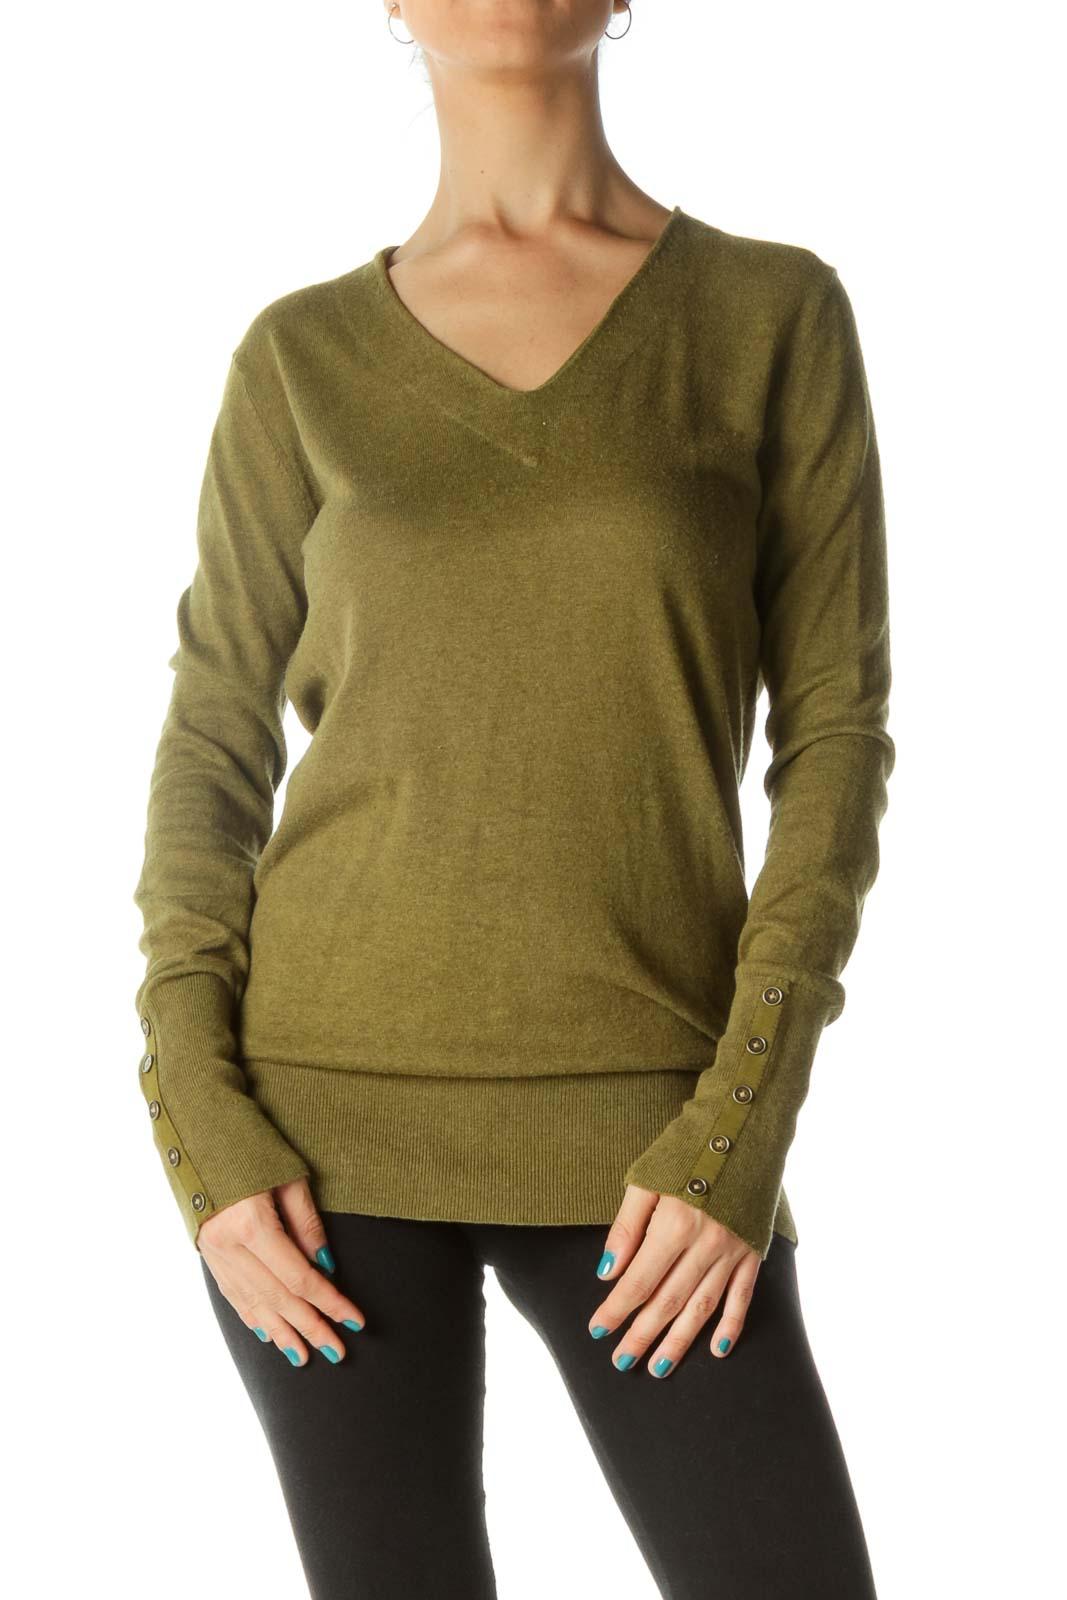 Green V-Neck Wrist Buttons Silk Pullover Sweater